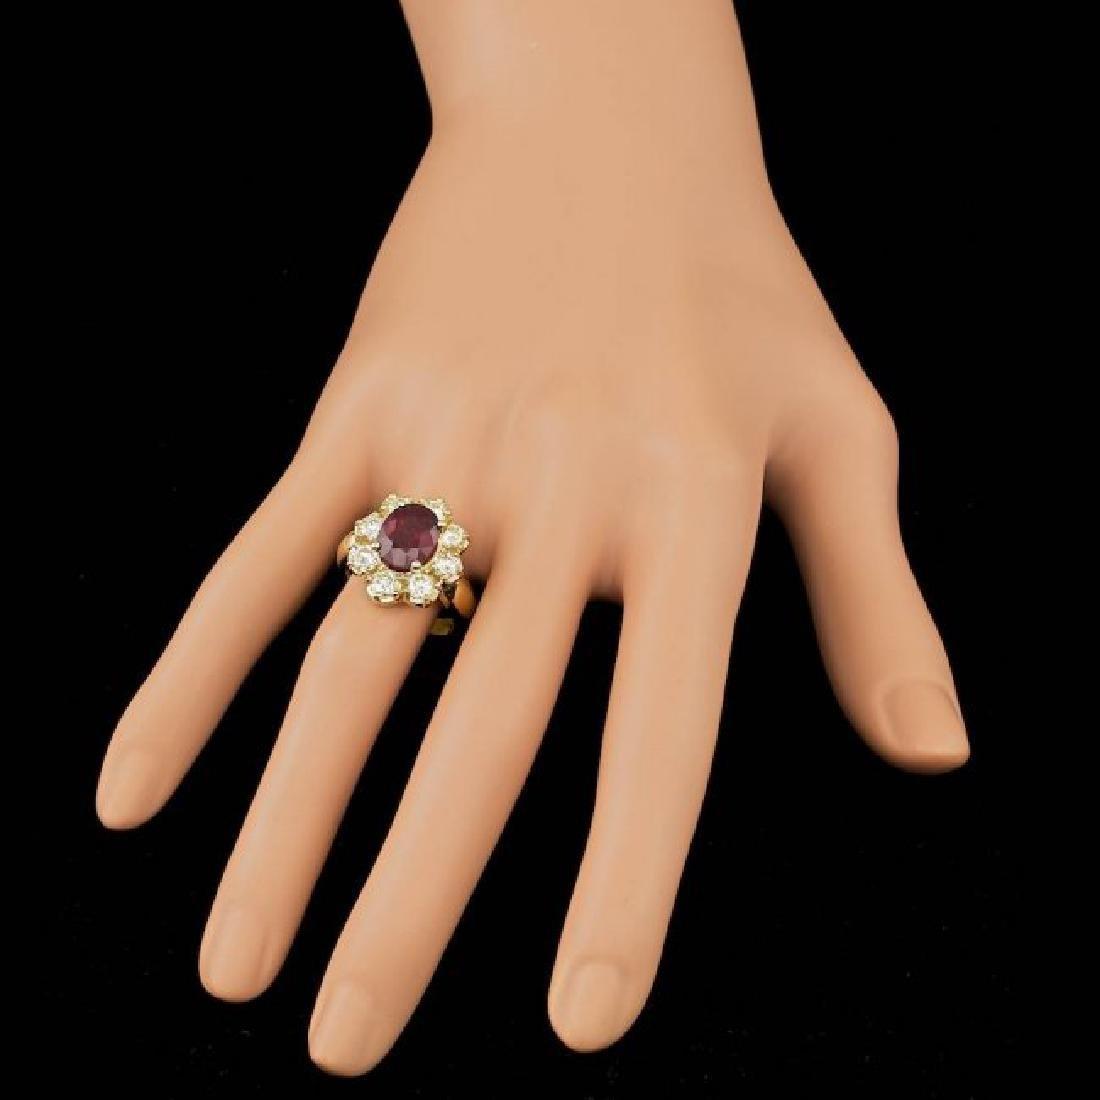 14k Yellow Gold 3.00ct Ruby 1.50ct Diamond Ring - 4